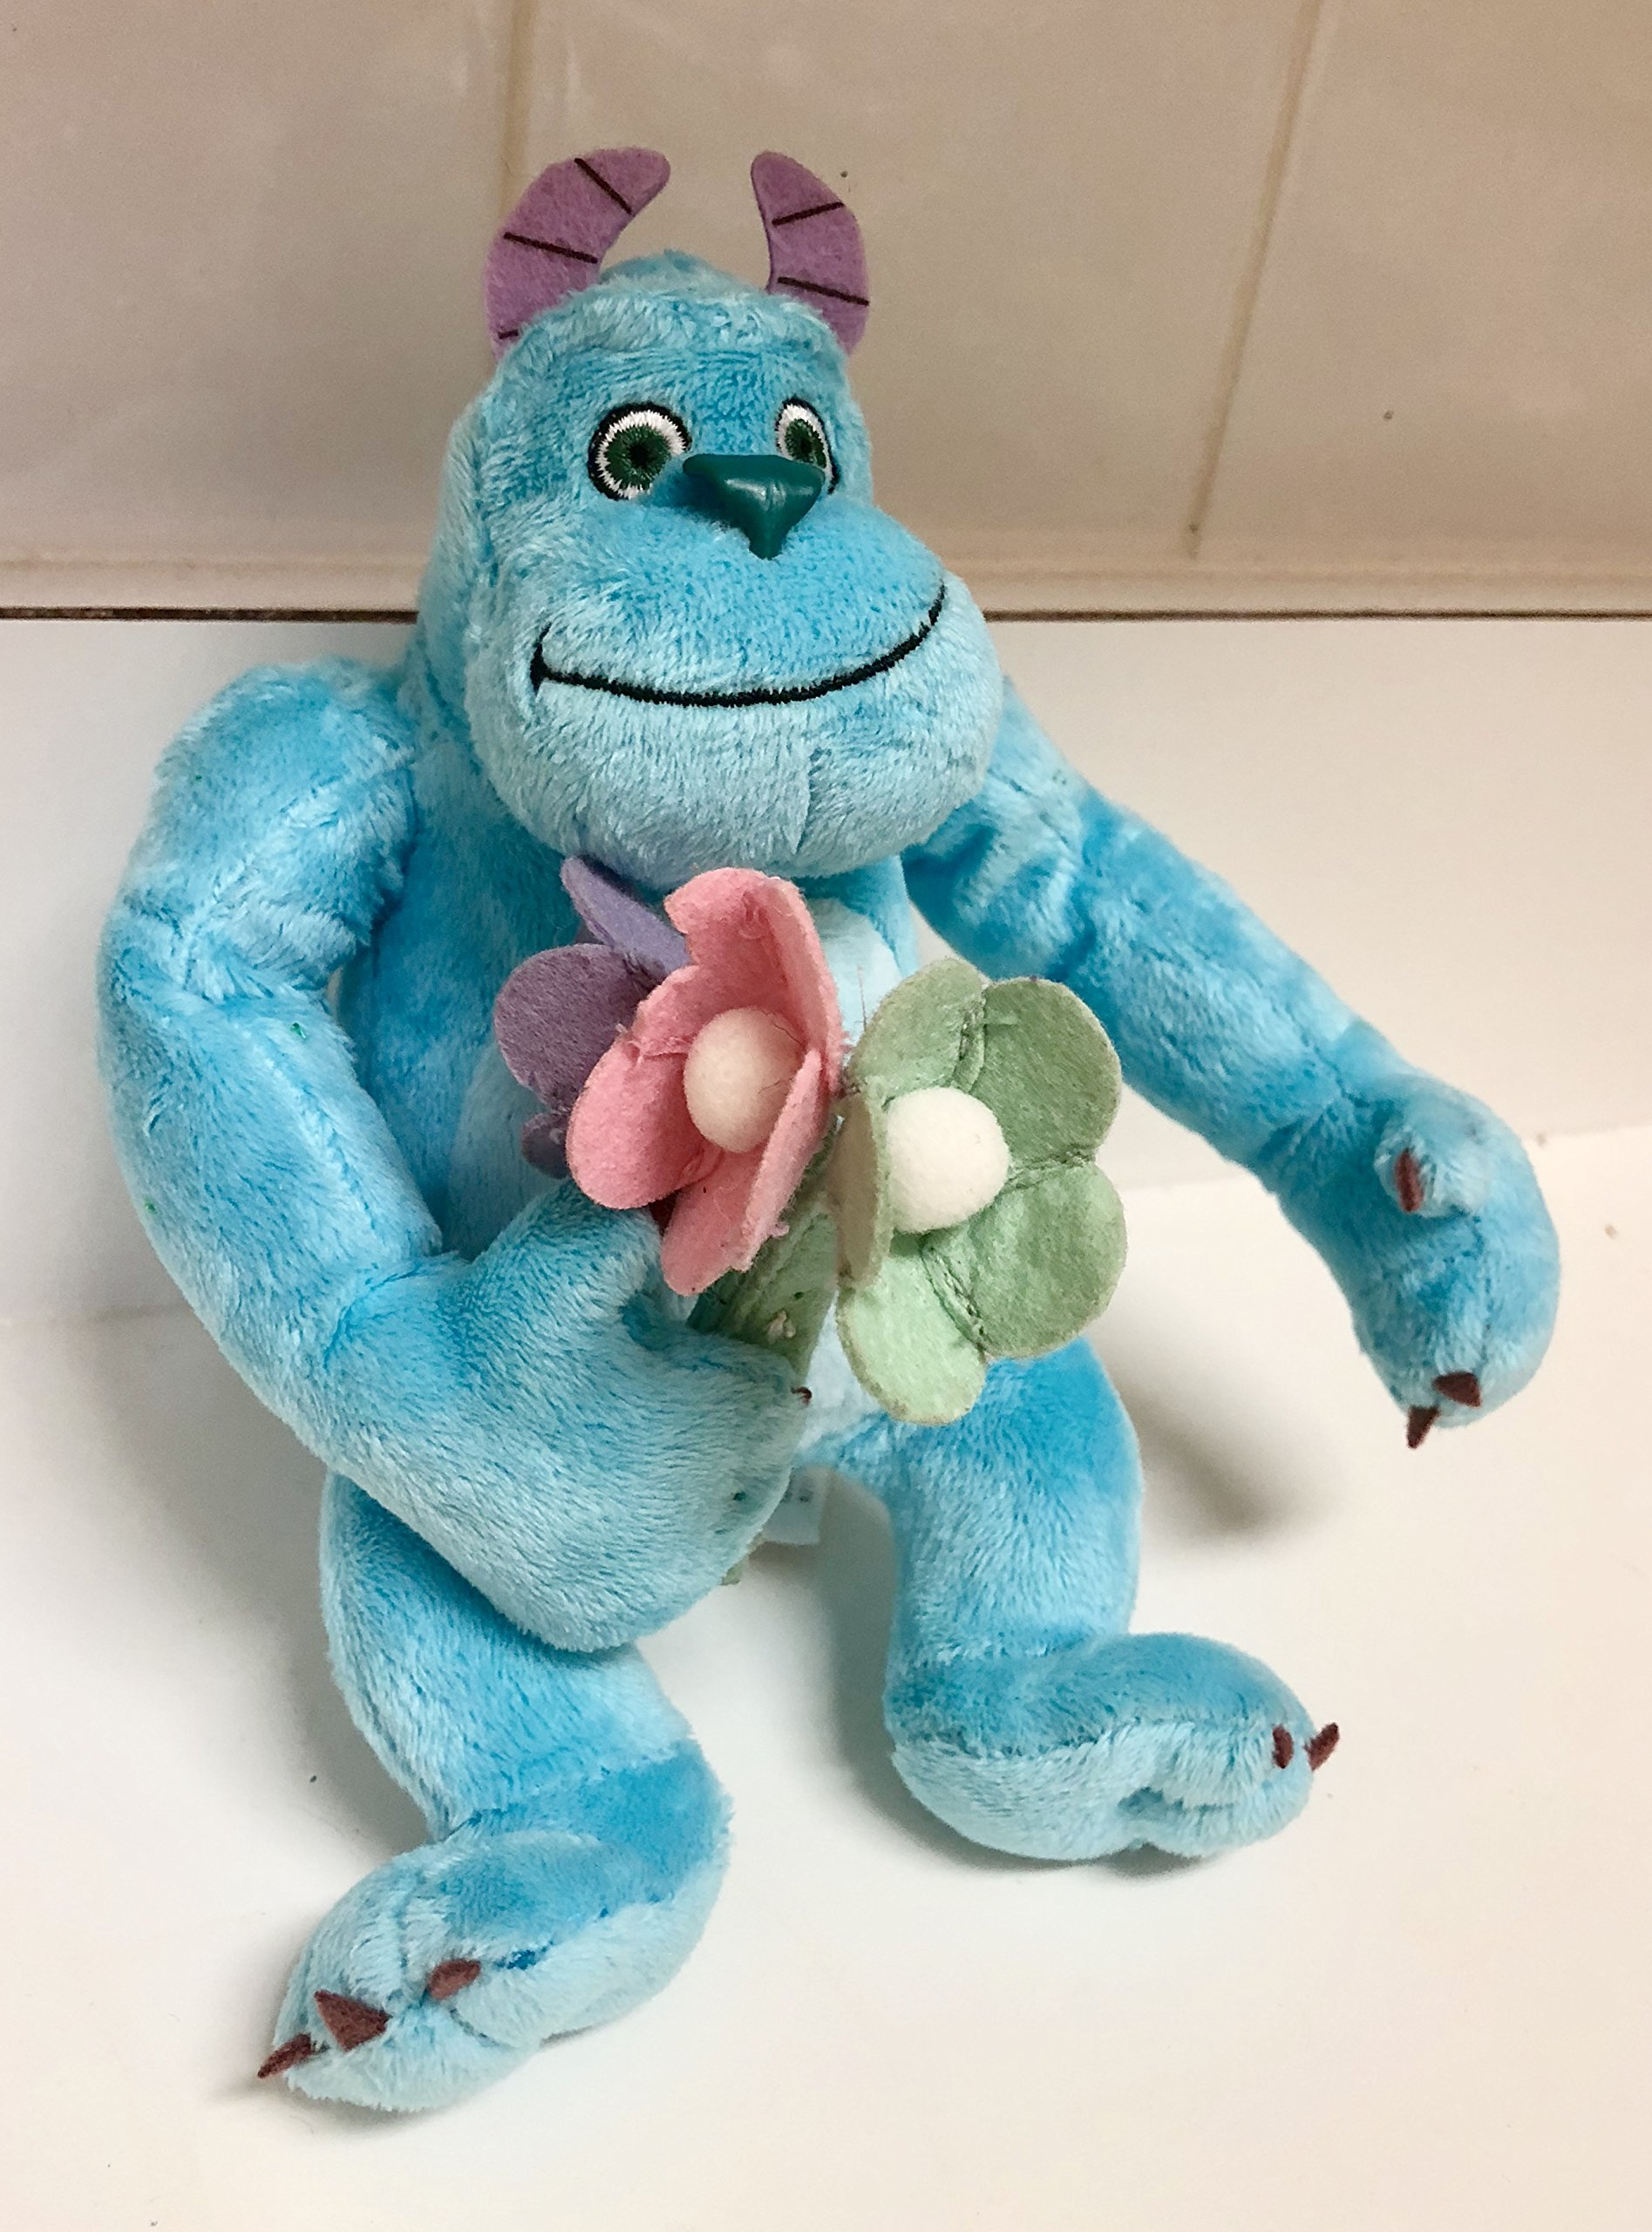 Disney Monster Inc University Sullivan Sully Sulley 7'' Plush Soft Holding Flowers Easter Spring Valentine's Stuffed Toy